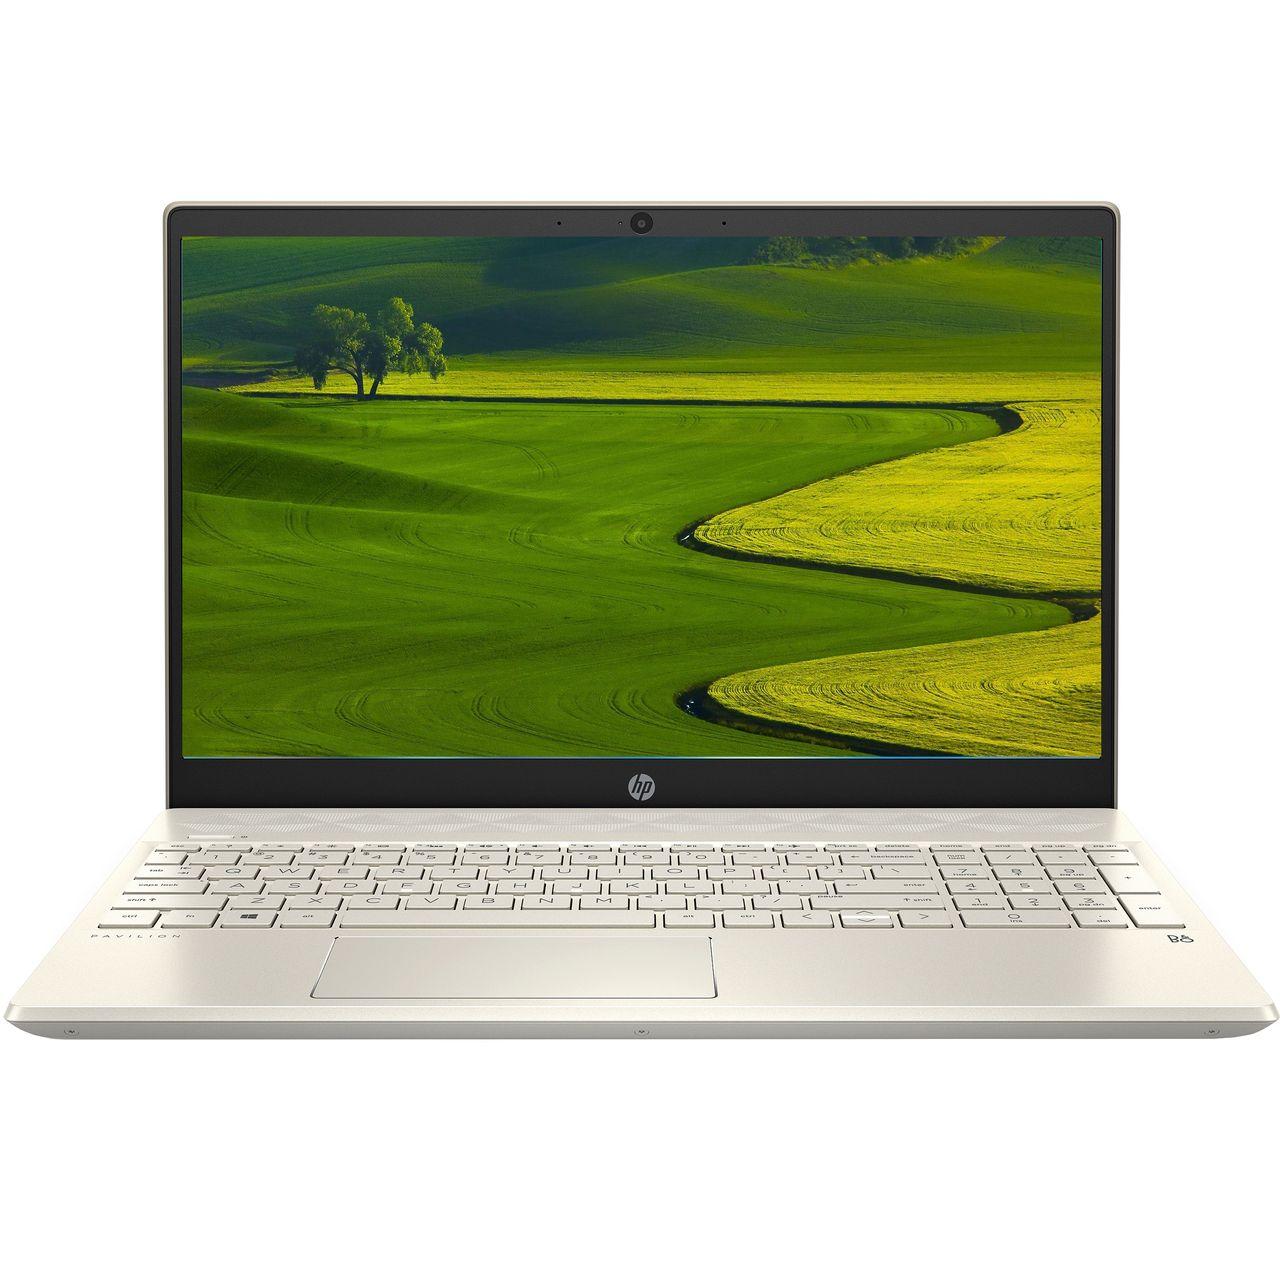 لپ تاپ 15.6 اینچی اچپی مدل Pavilion CS3458-D